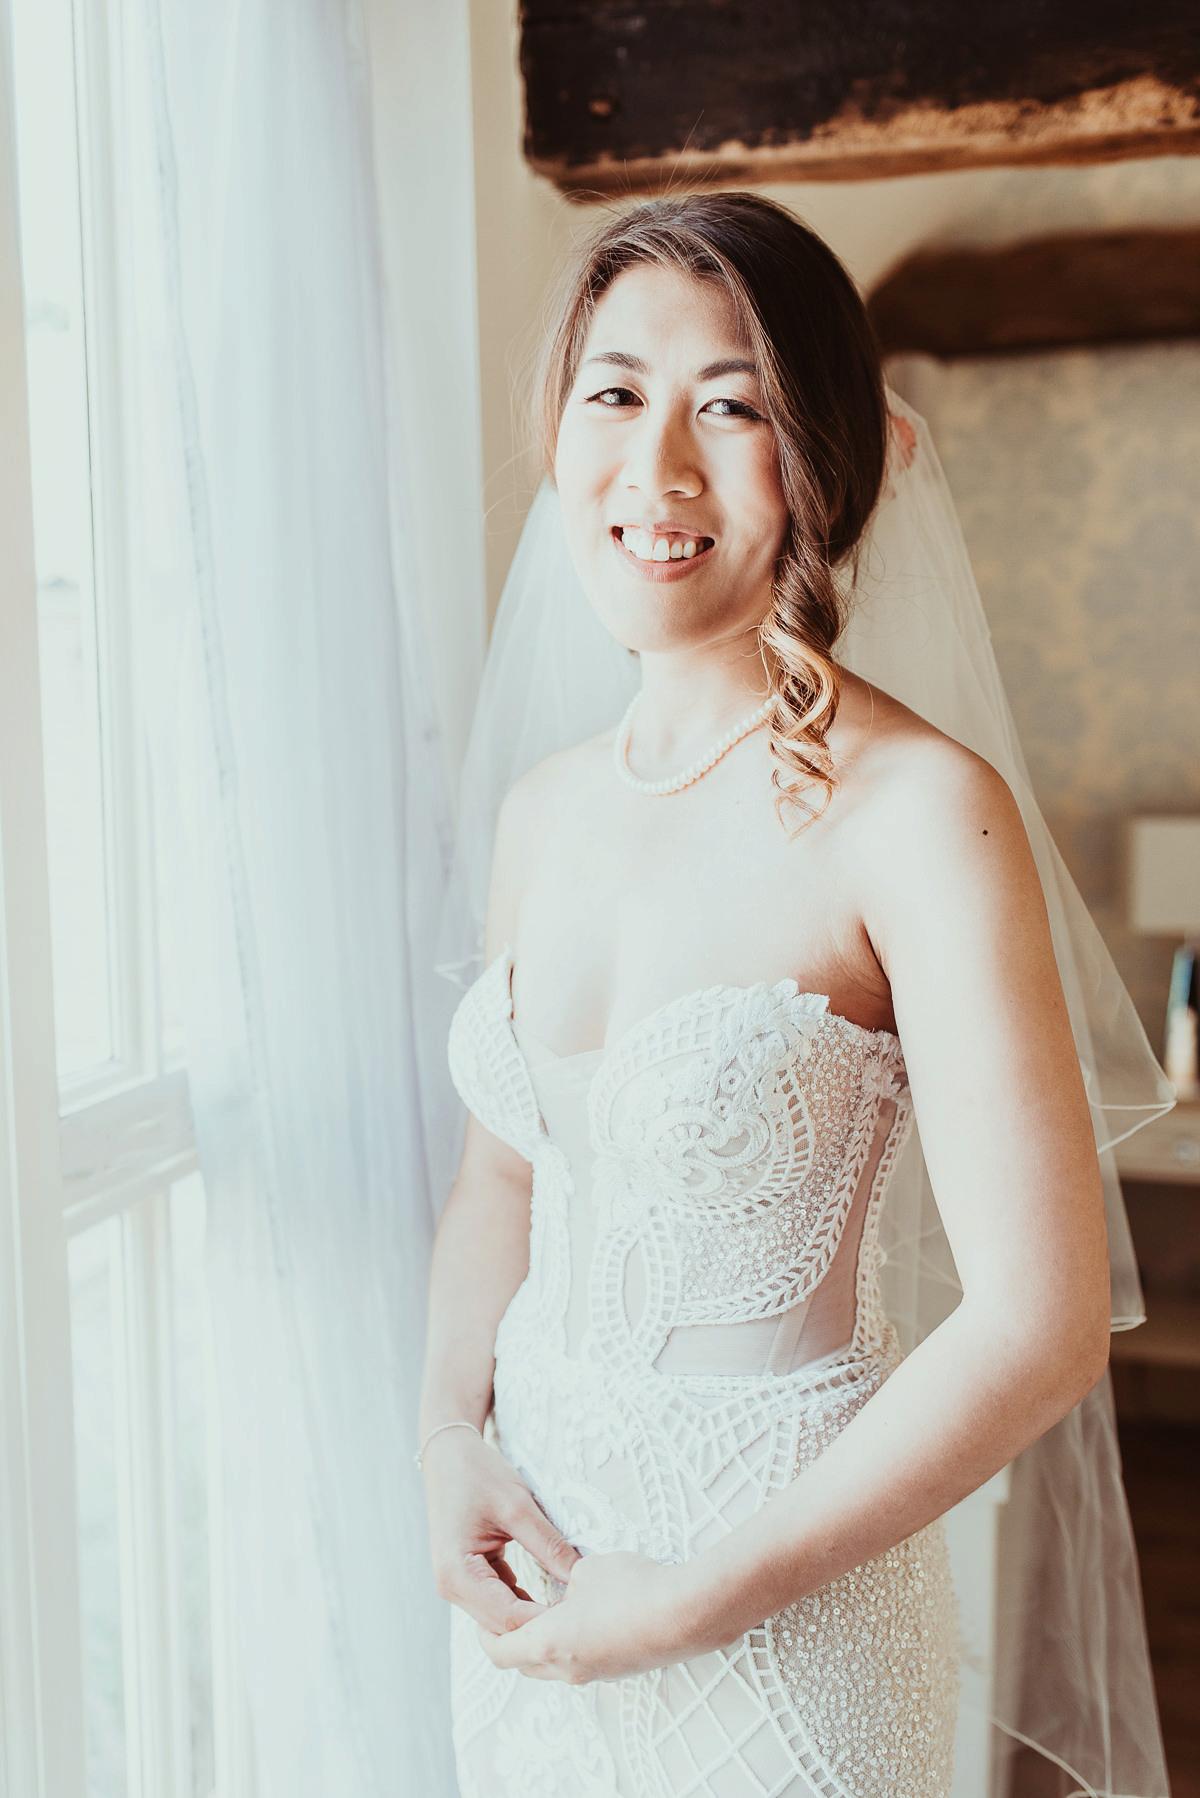 Pinterest Amberluxxe Bridal Vows Wedding Gowns Ceremony Bride